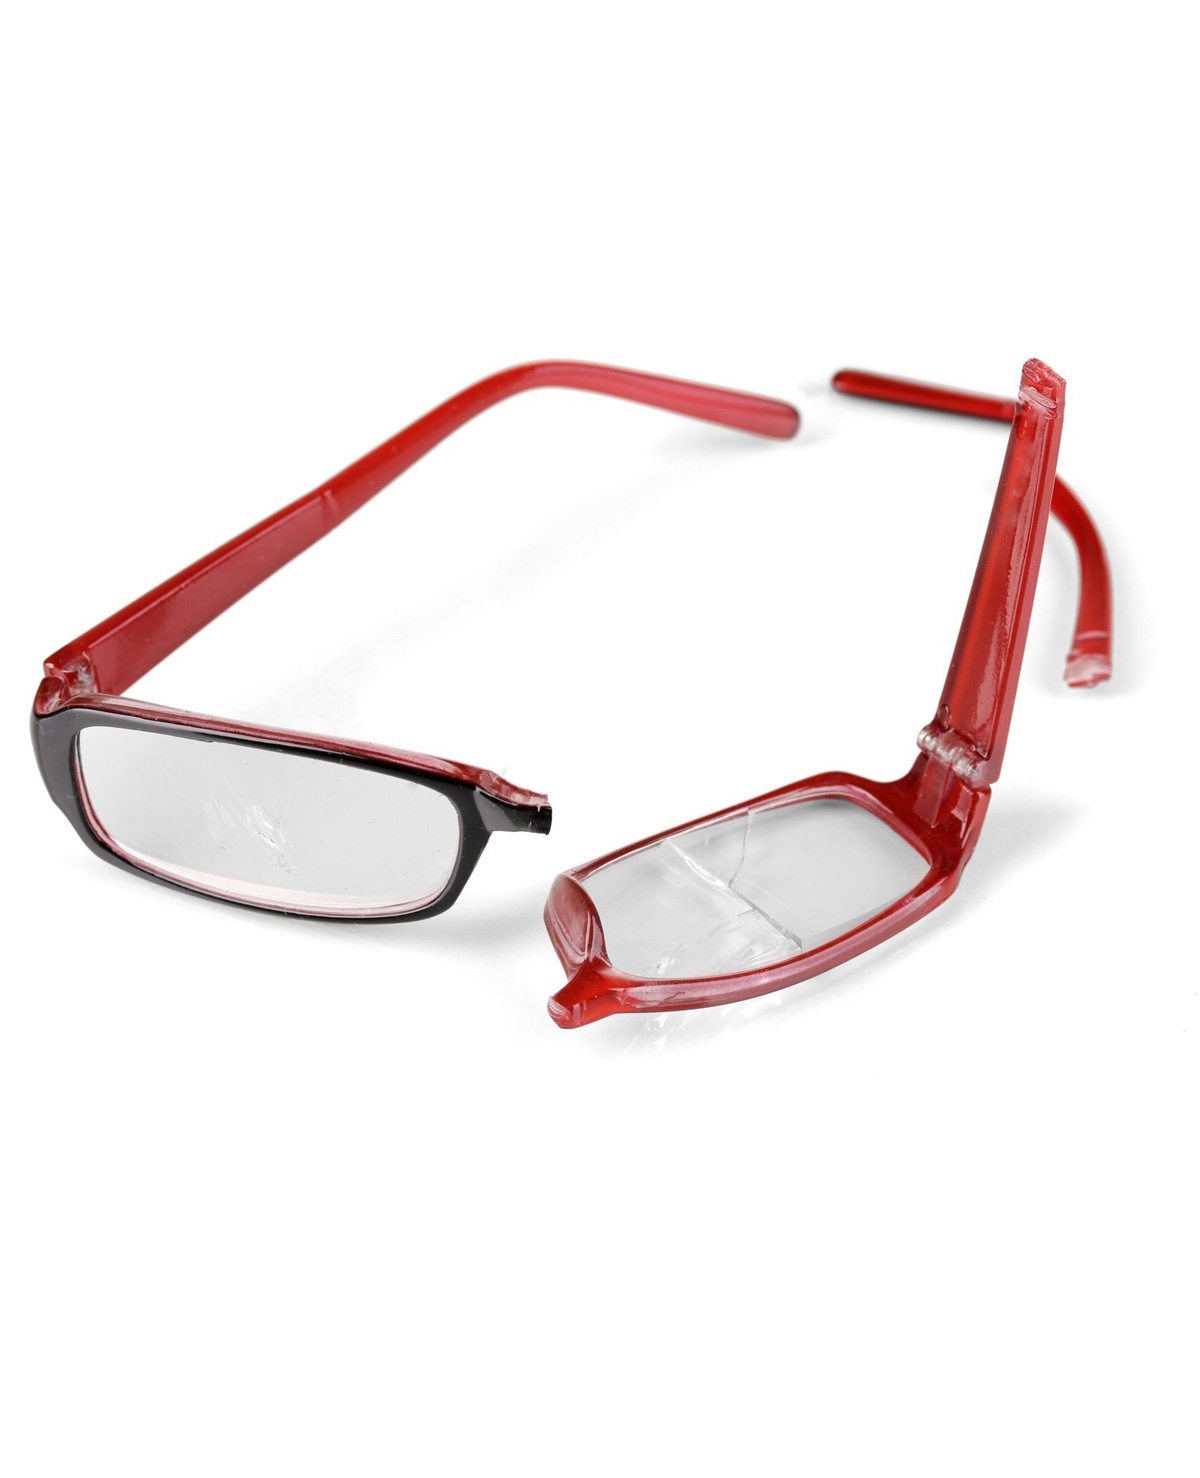 Denise blogt: Nieuwe bril